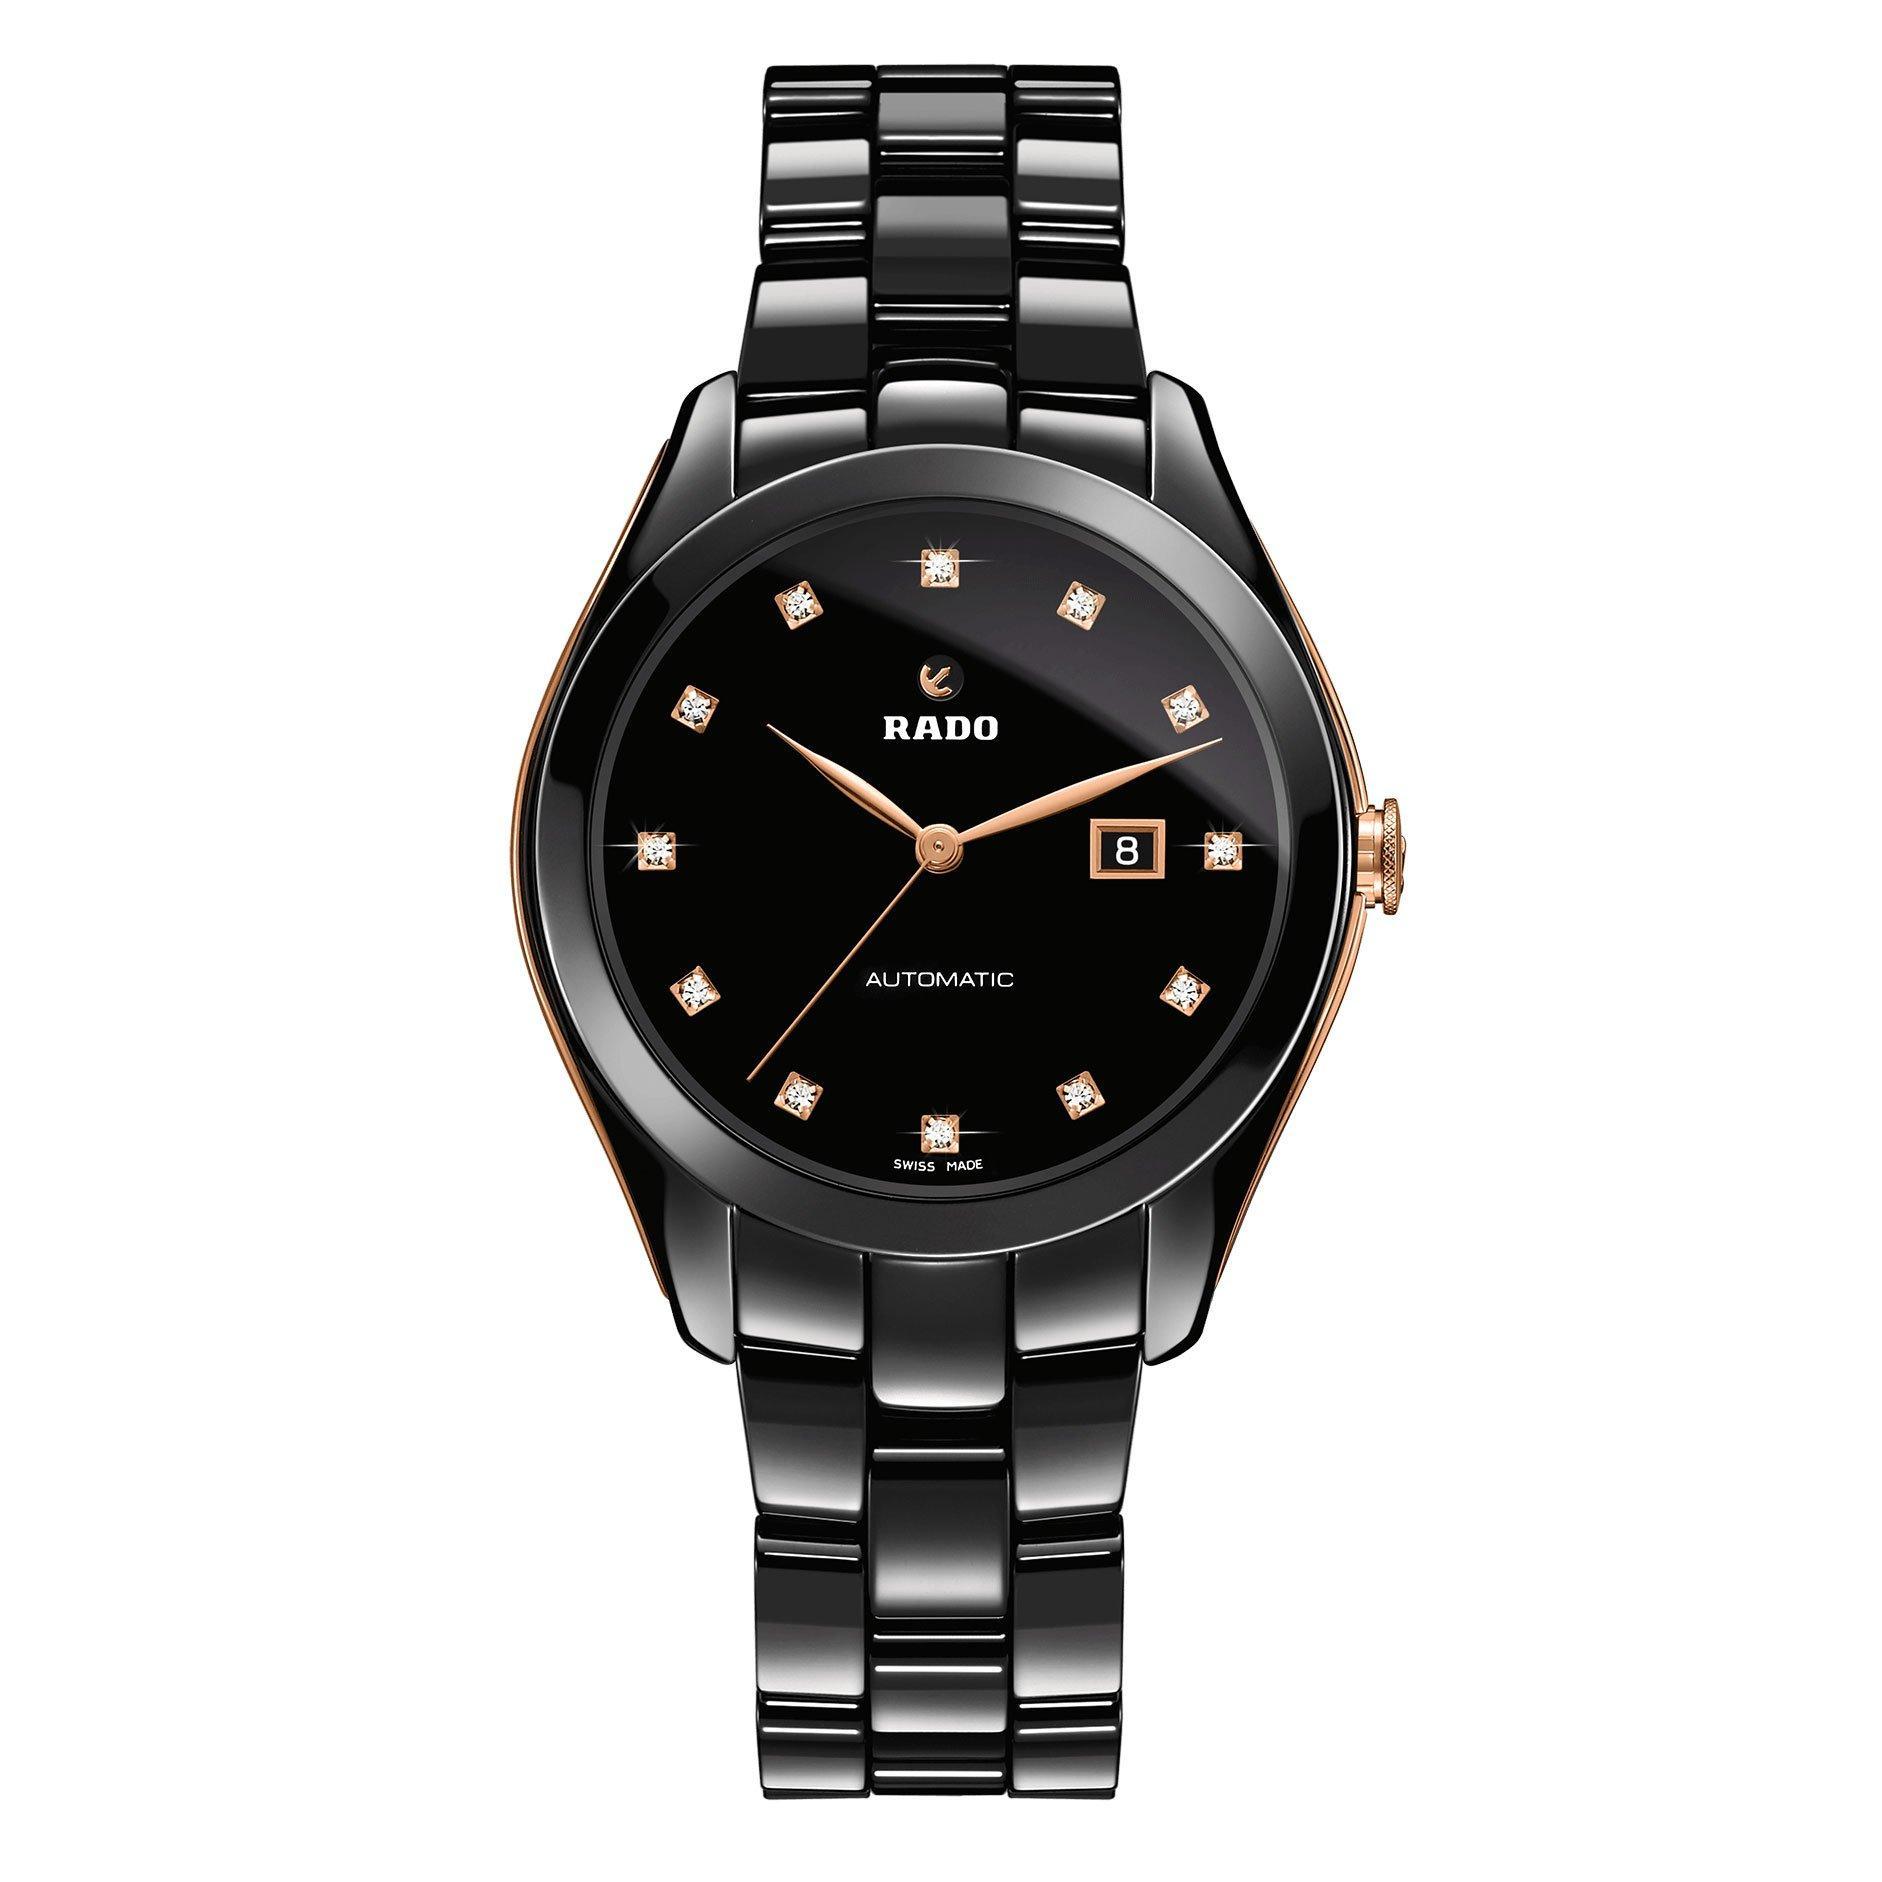 Rado Hyperchrome Automatic Diamonds Limited Edition Ladies Watch